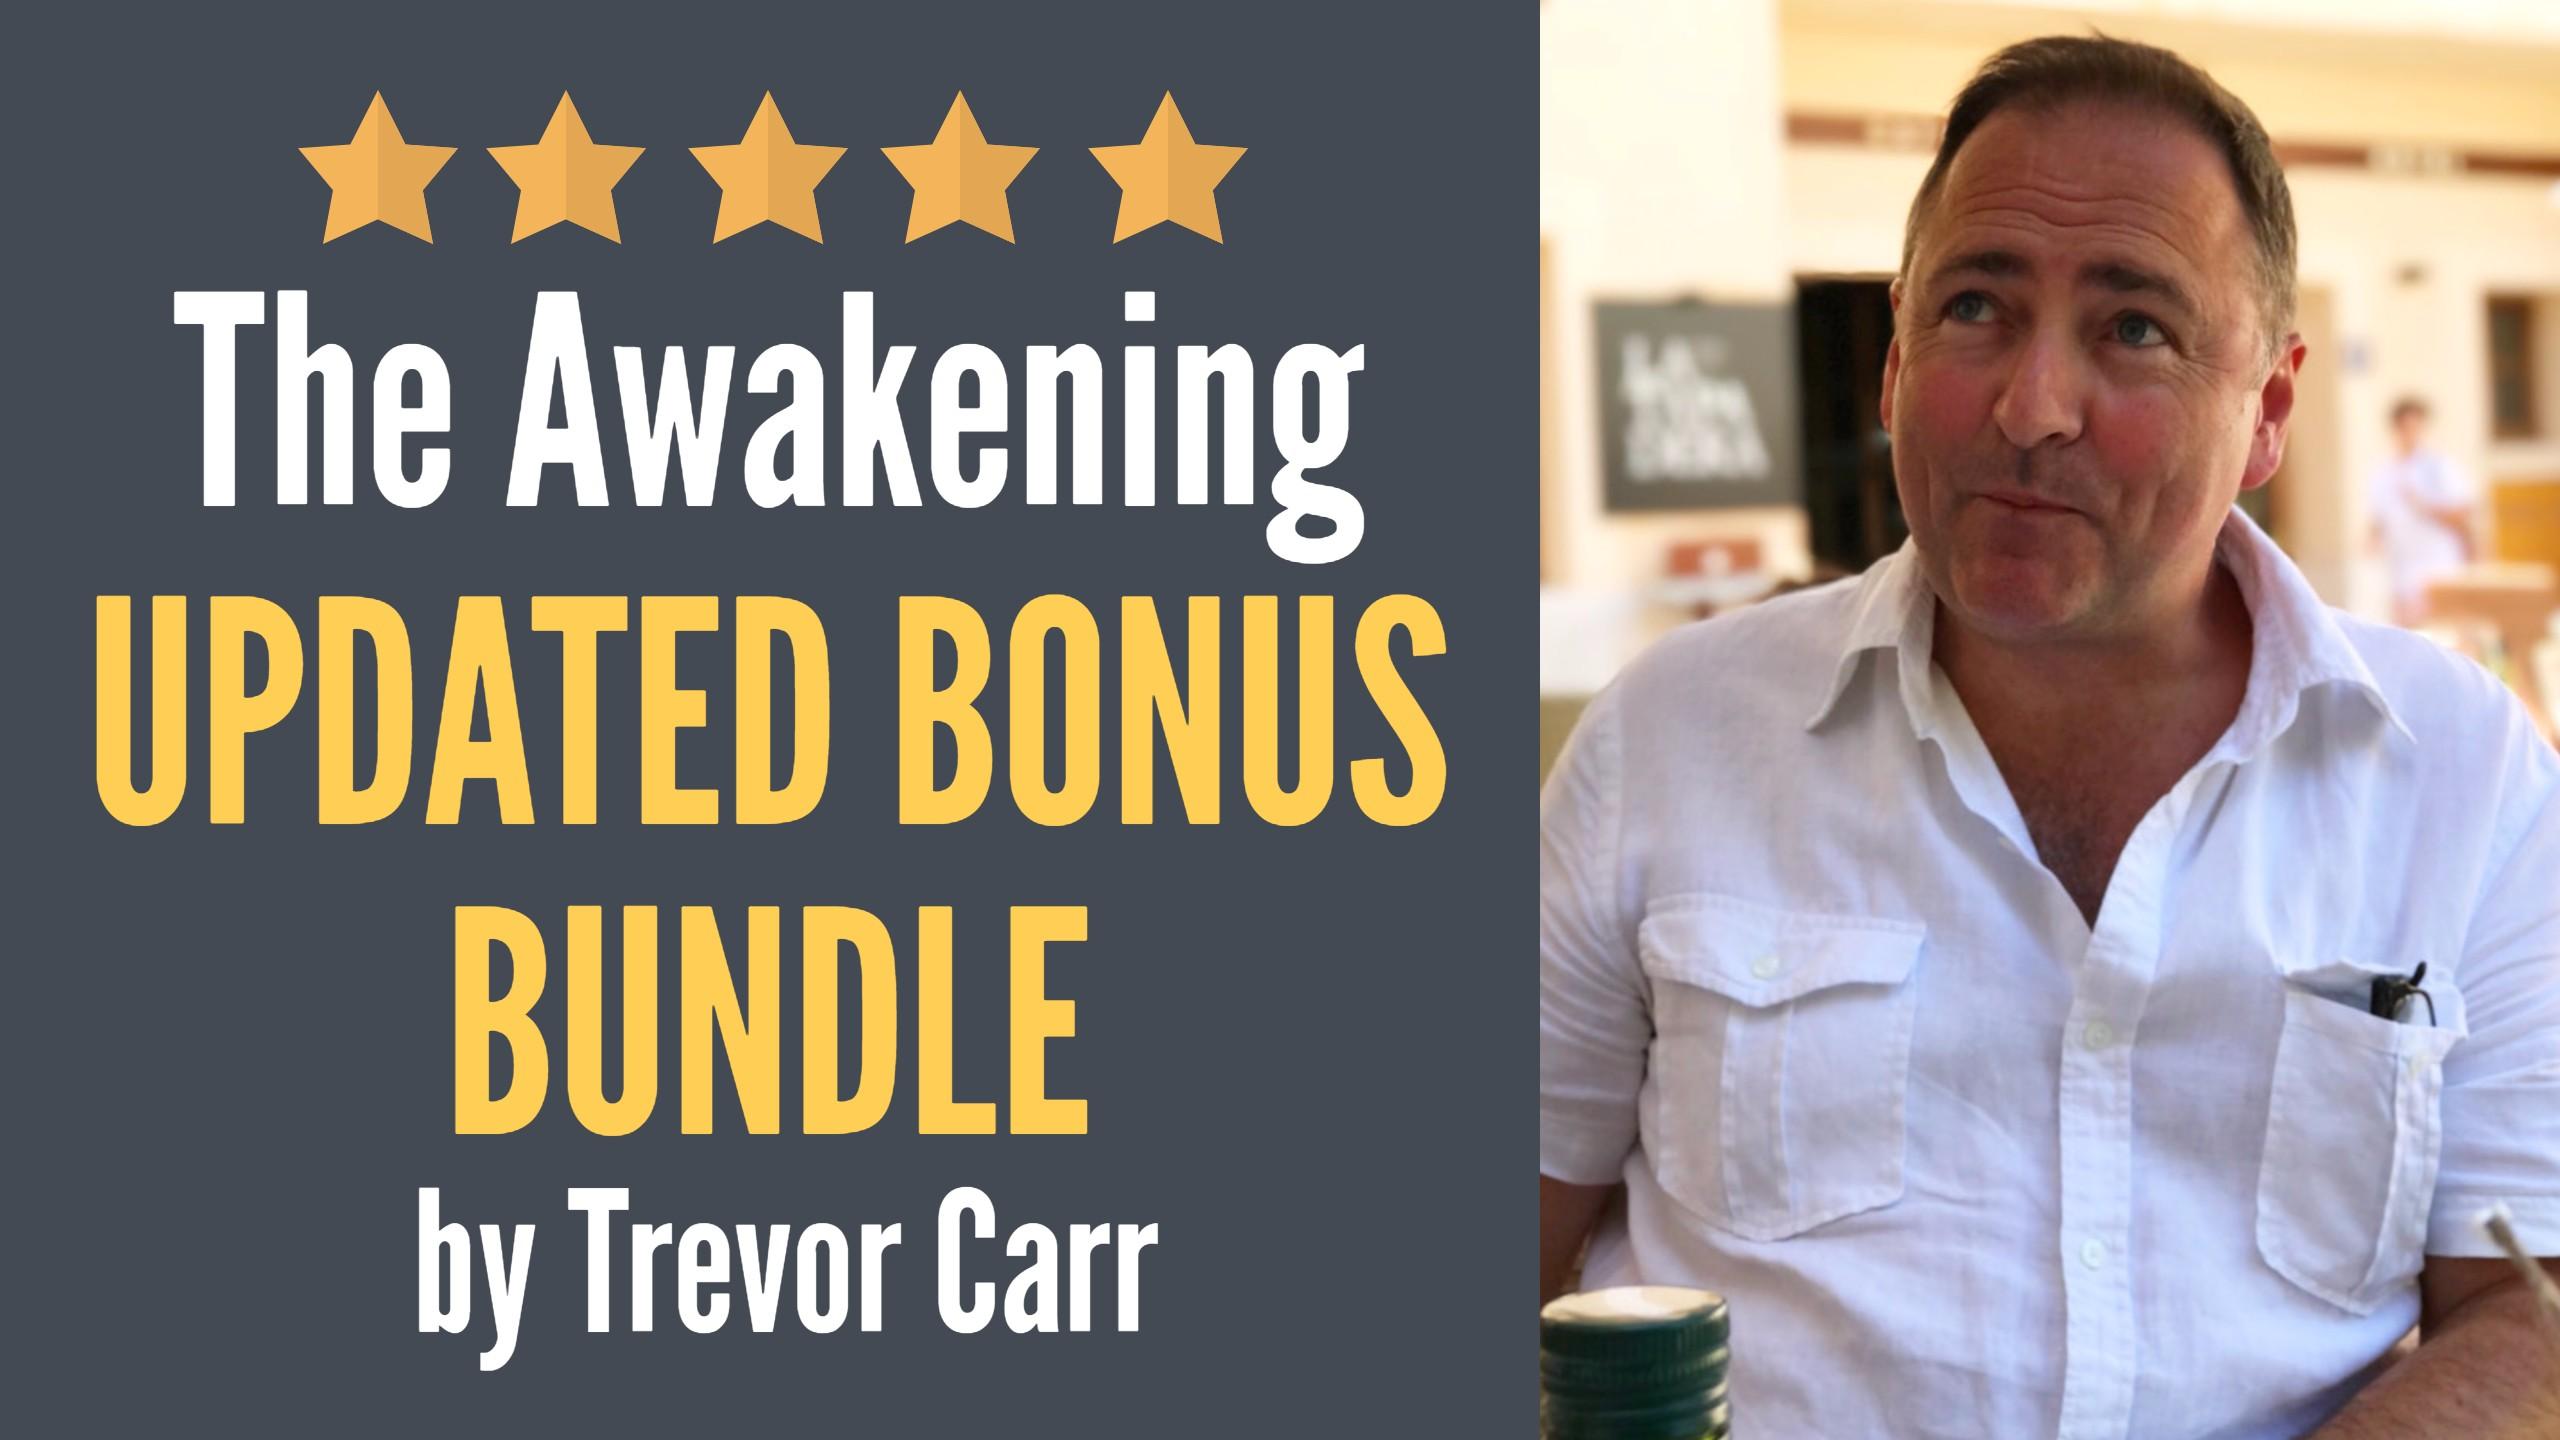 The Awakening Review and Bonuses